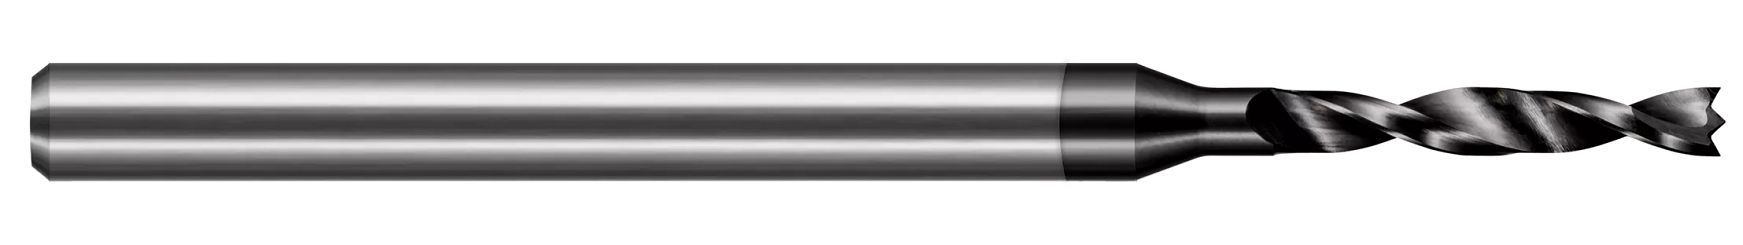 Miniature High Performance Drills - Composites - Brad Point